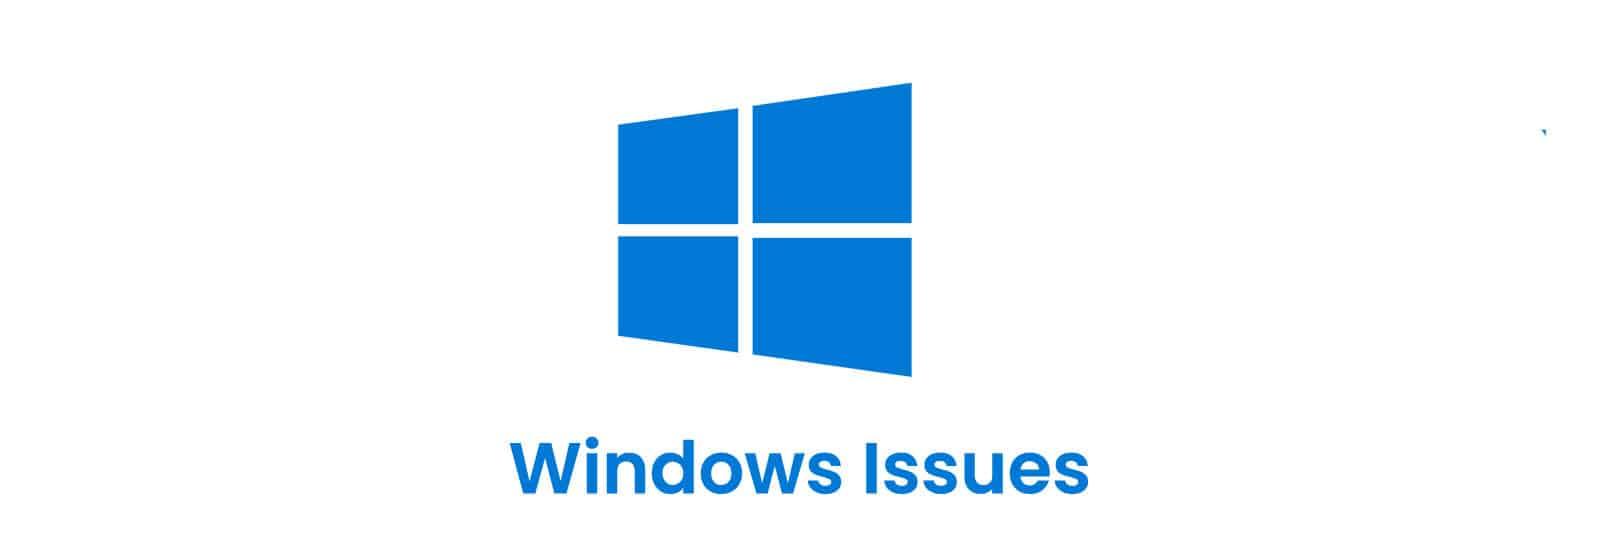 windows-issues